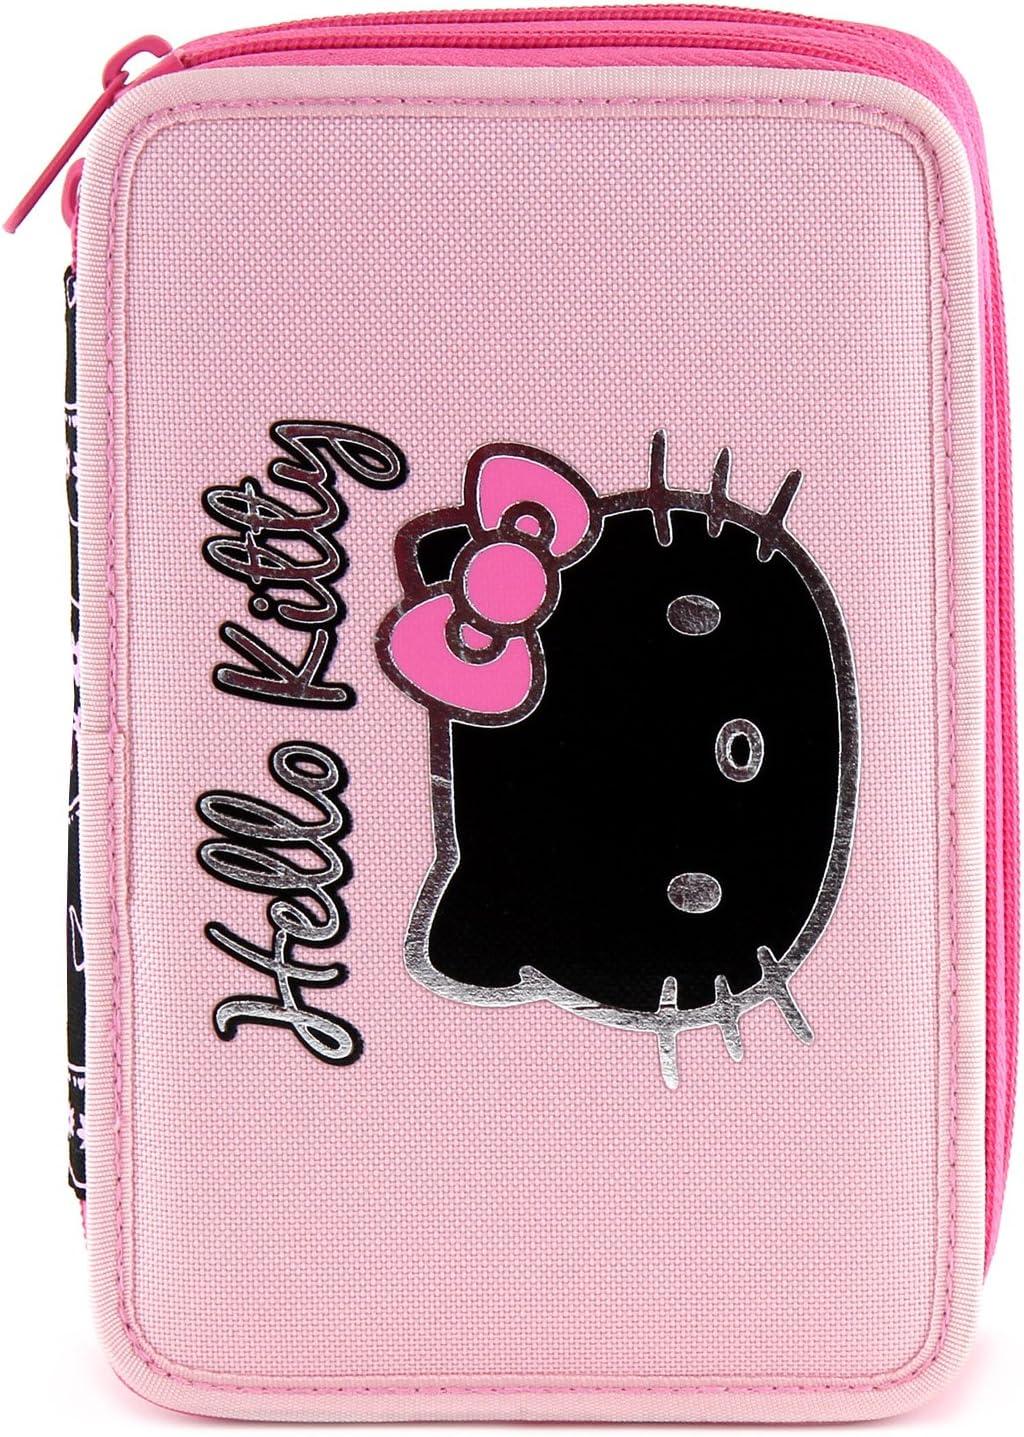 Hello Kitty 11-1937 - Estuche Doble Completo para Escuela: Amazon.es: Equipaje